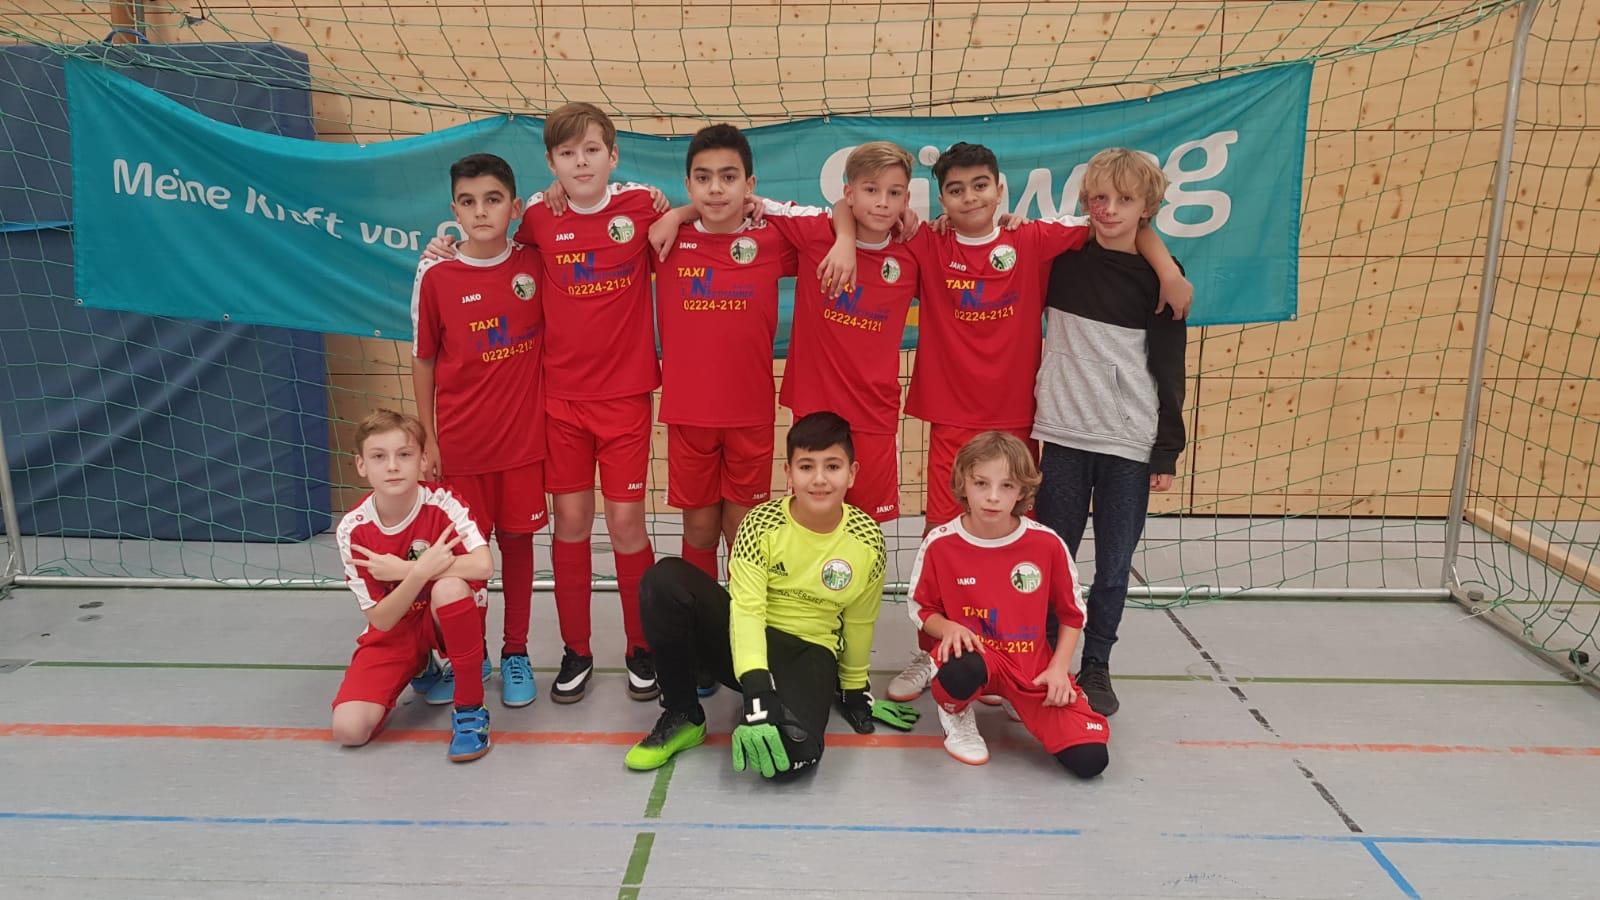 D-Junioren U12 - JFV Siebengebirge